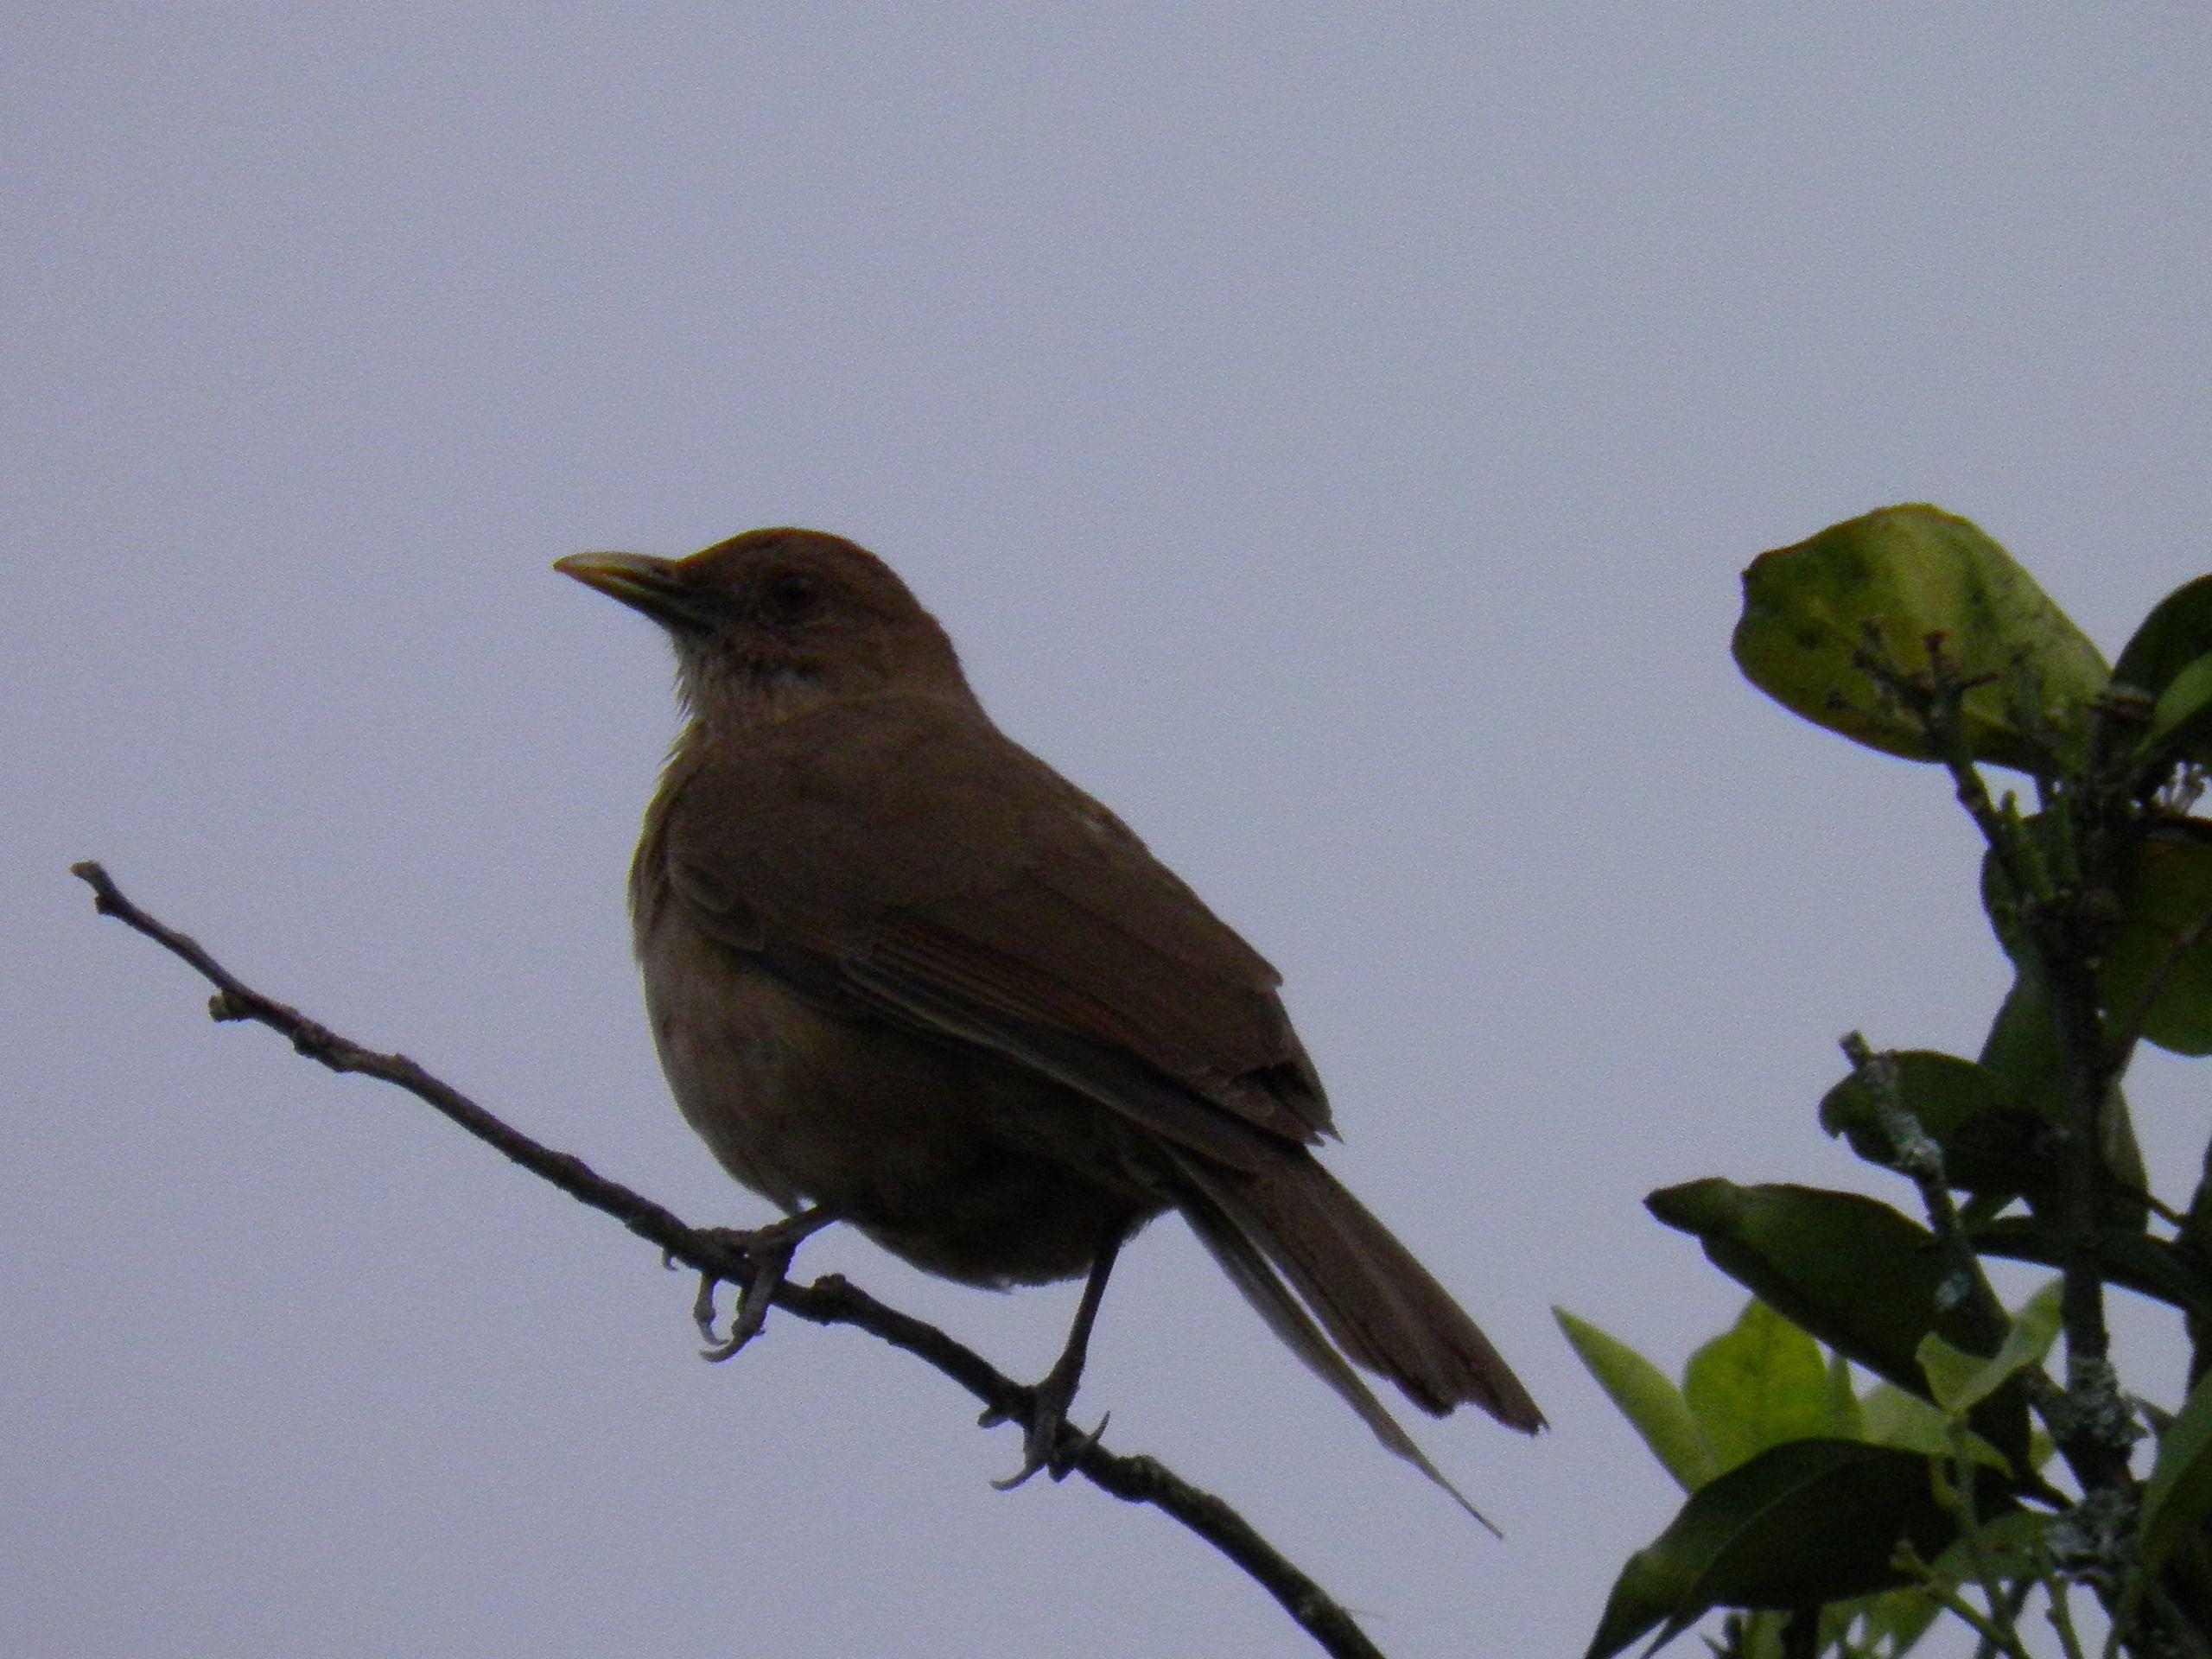 Claycolored Robin / Yigüirro. National bird of Costa Rica